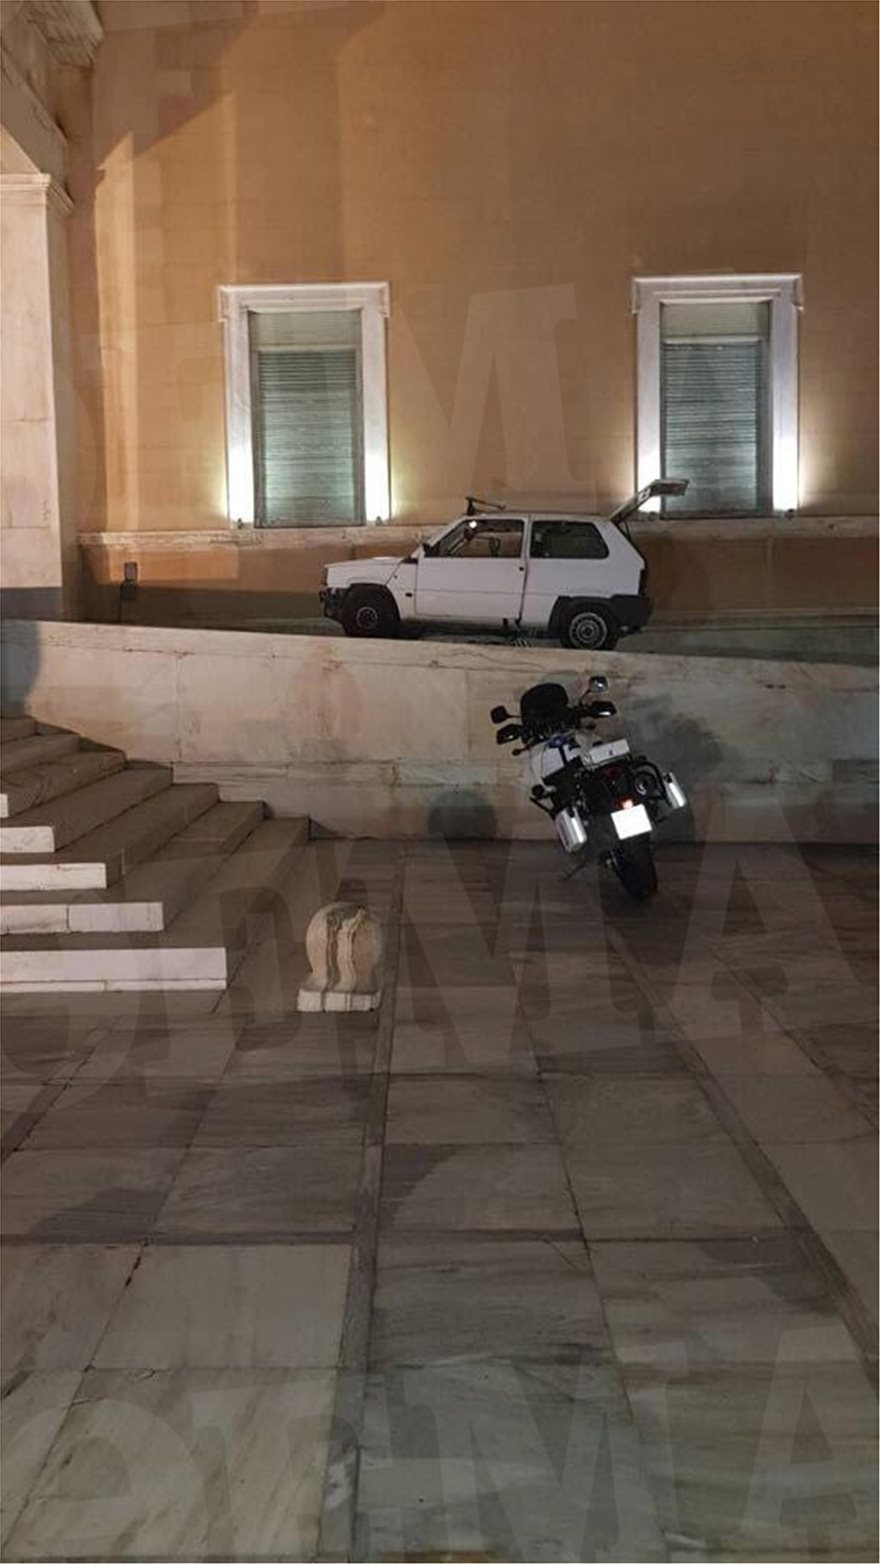 panda_arthro  Αυτό είναι το Fiat Panda που... εισέβαλε στη Βουλή ! panda arthro